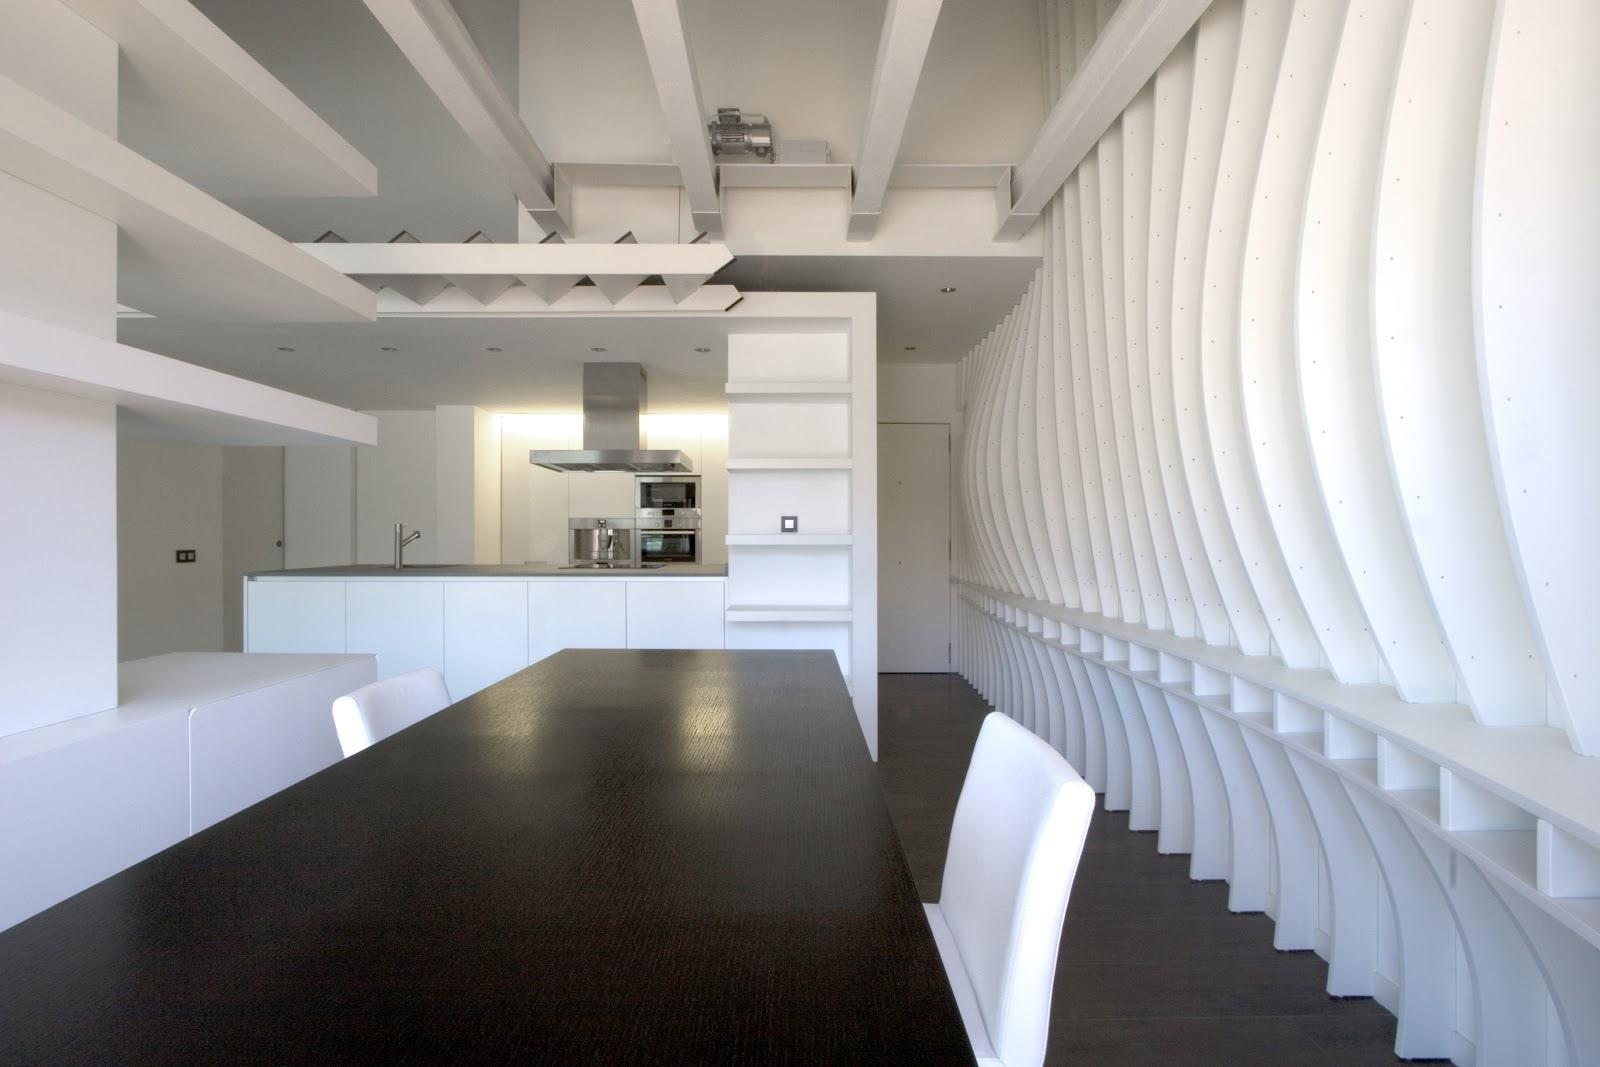 Opiniones de espacio arquitect nico for Dimensiones de espacios arquitectonicos